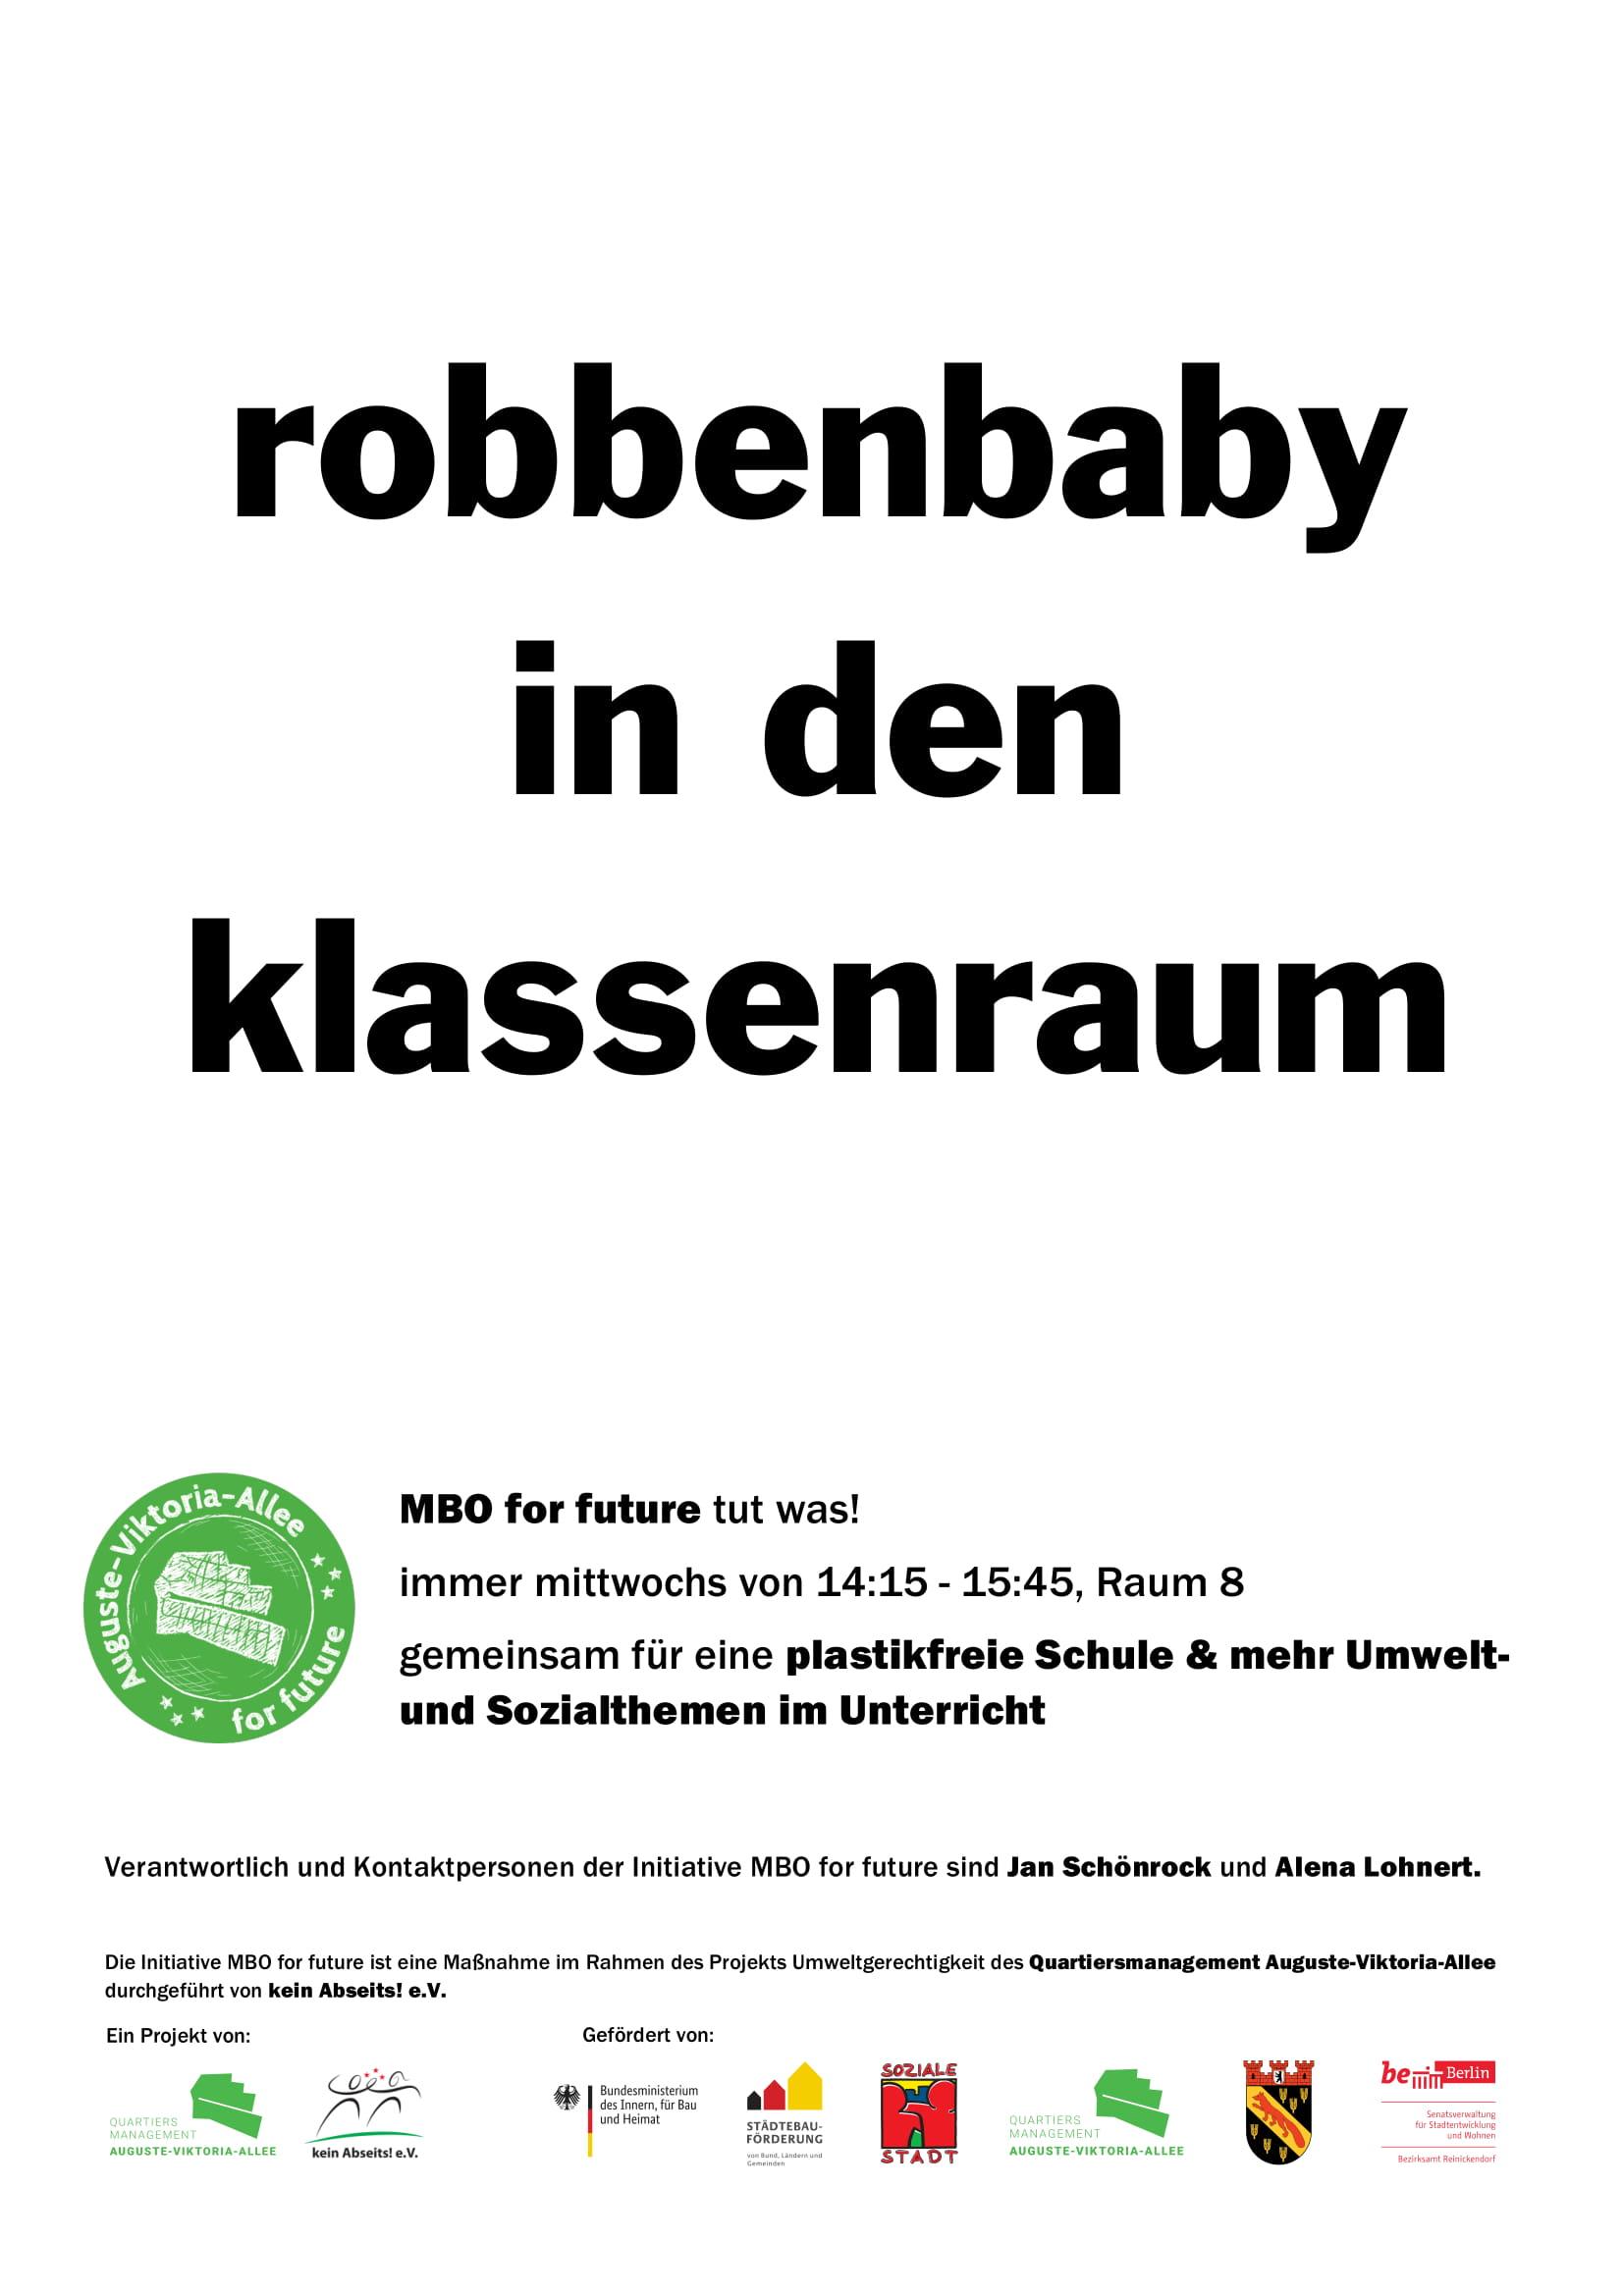 MBO-for-future_robbenbaby-1